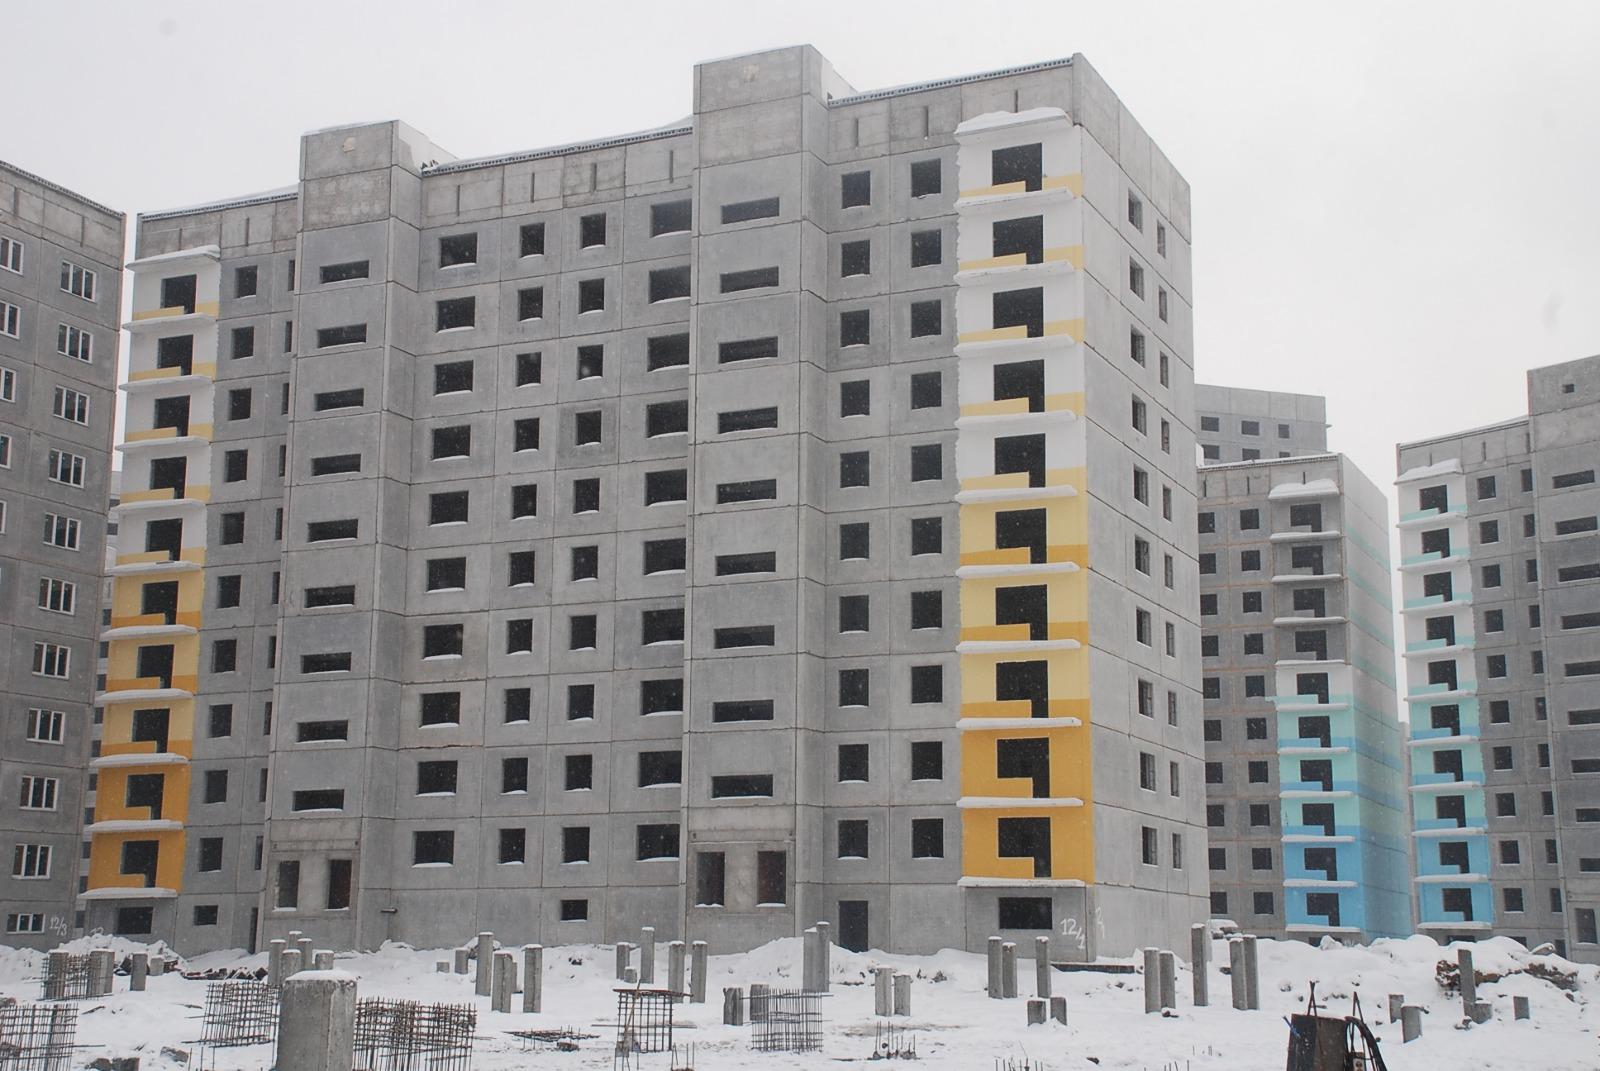 Продажа квартир в Новосибирске ул Бронная с фото  НГС